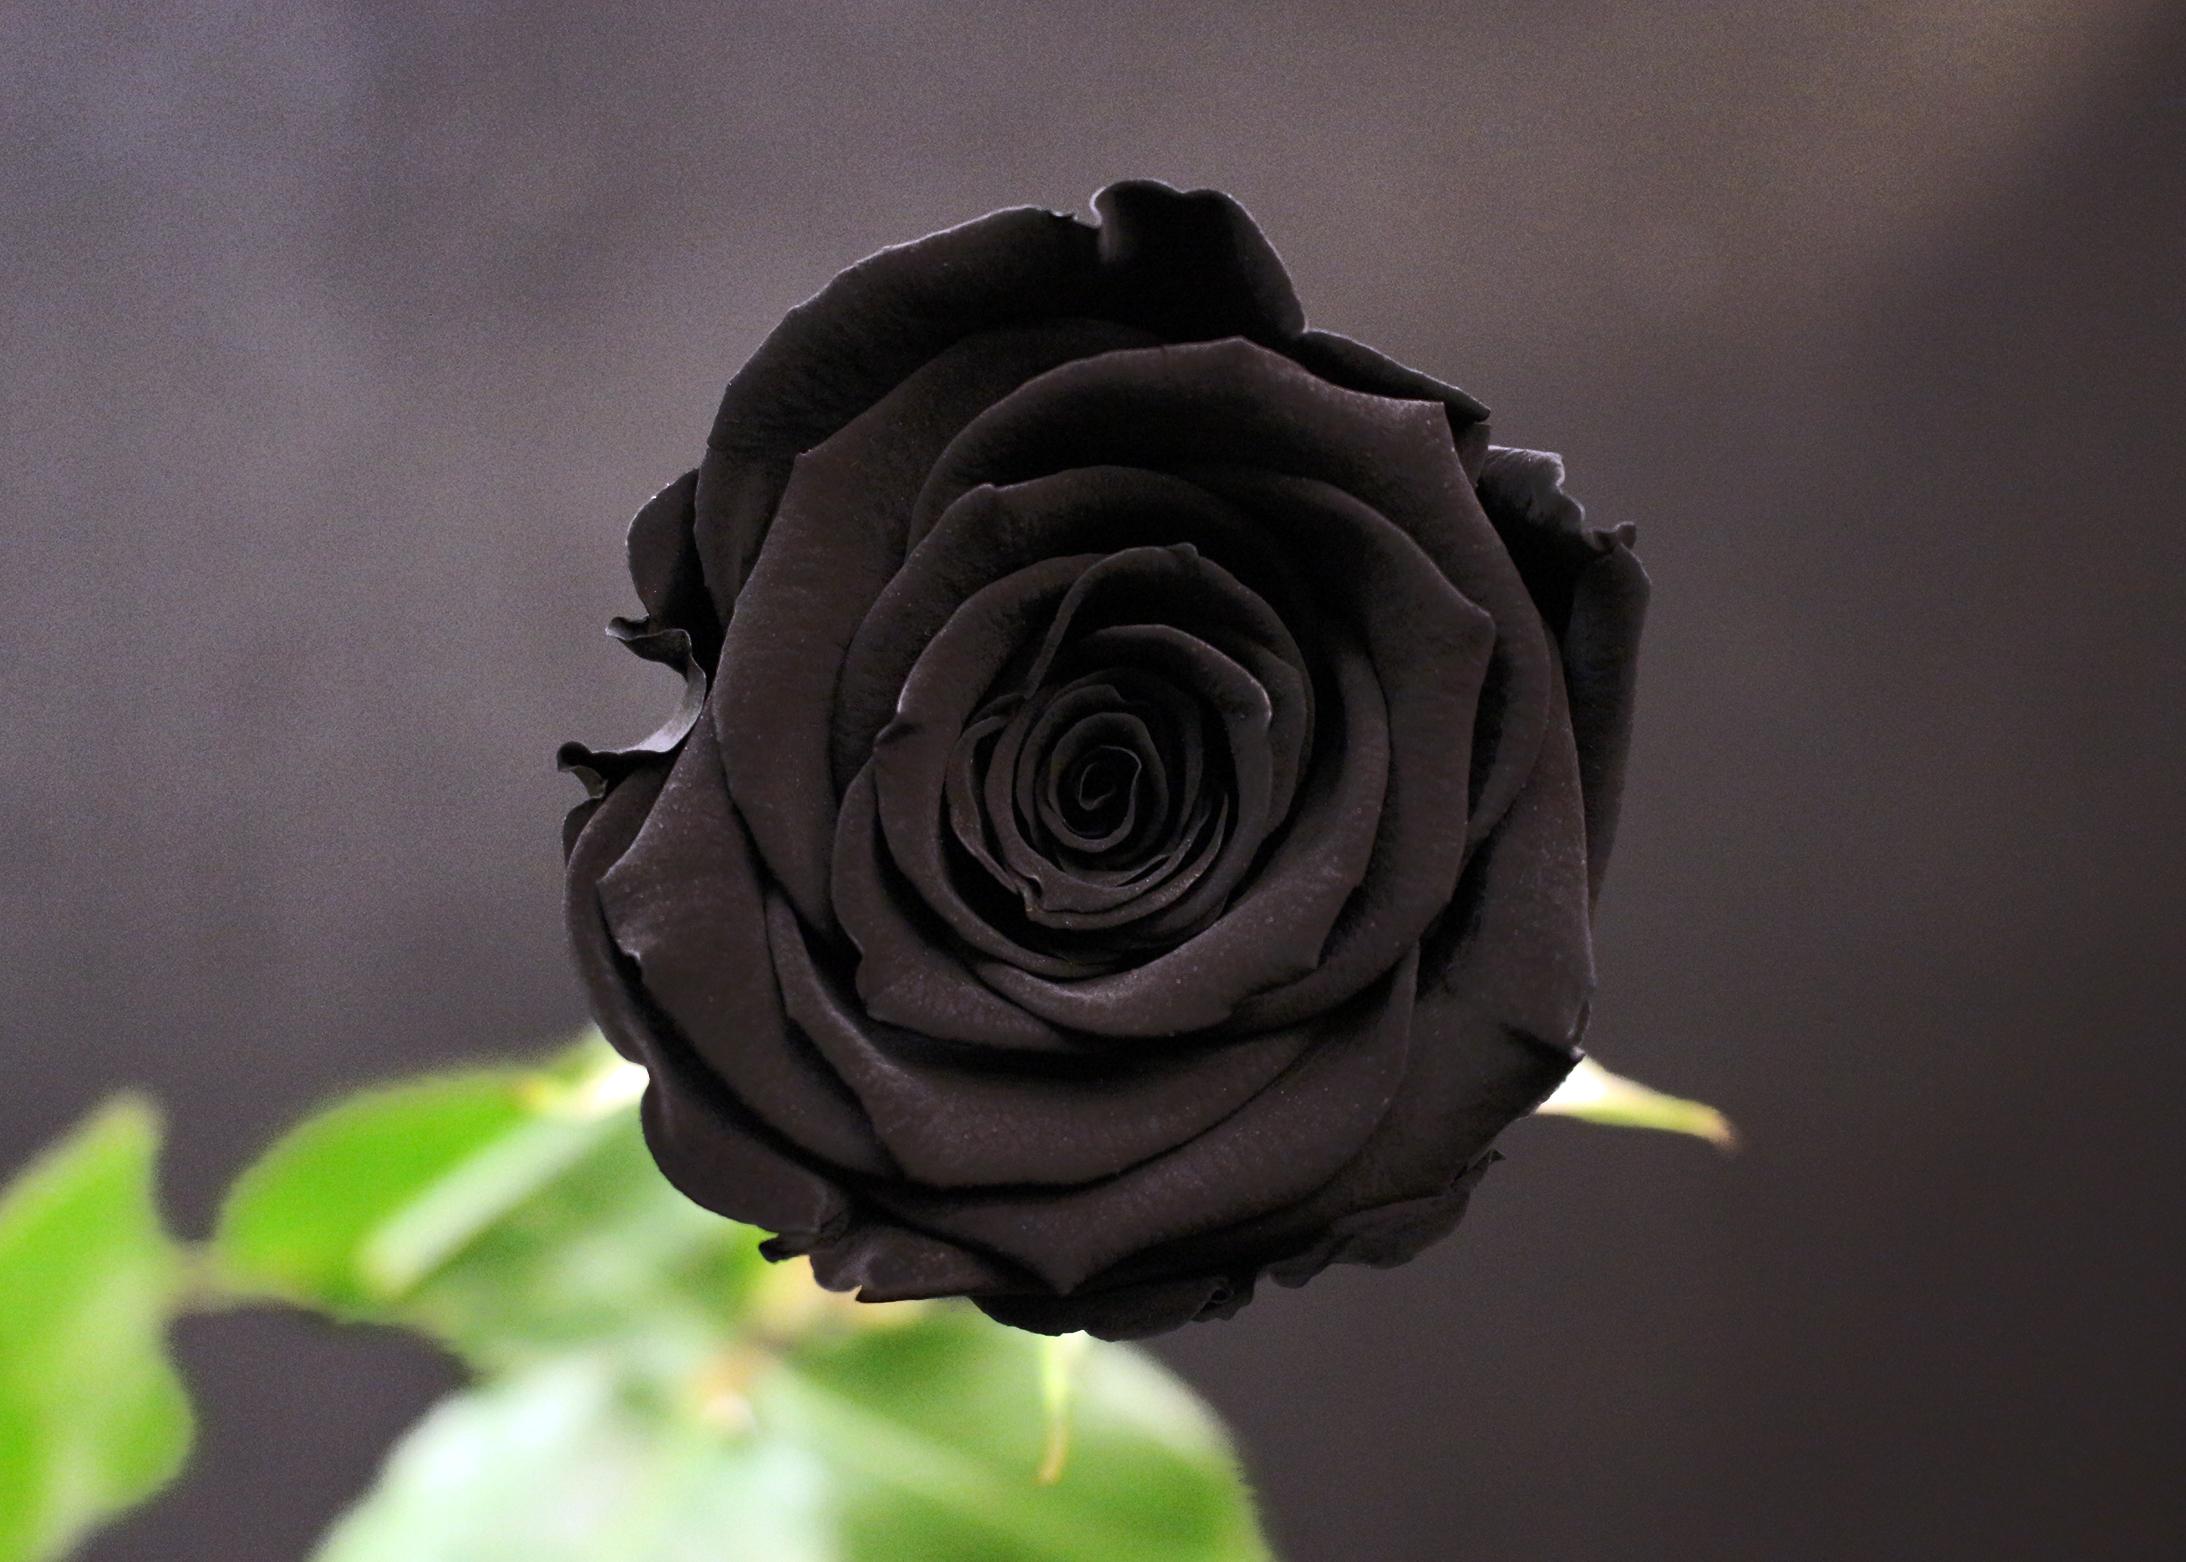 Rose noire fleurs de prestige fleuriste haut de gamme for Fleuriste rose